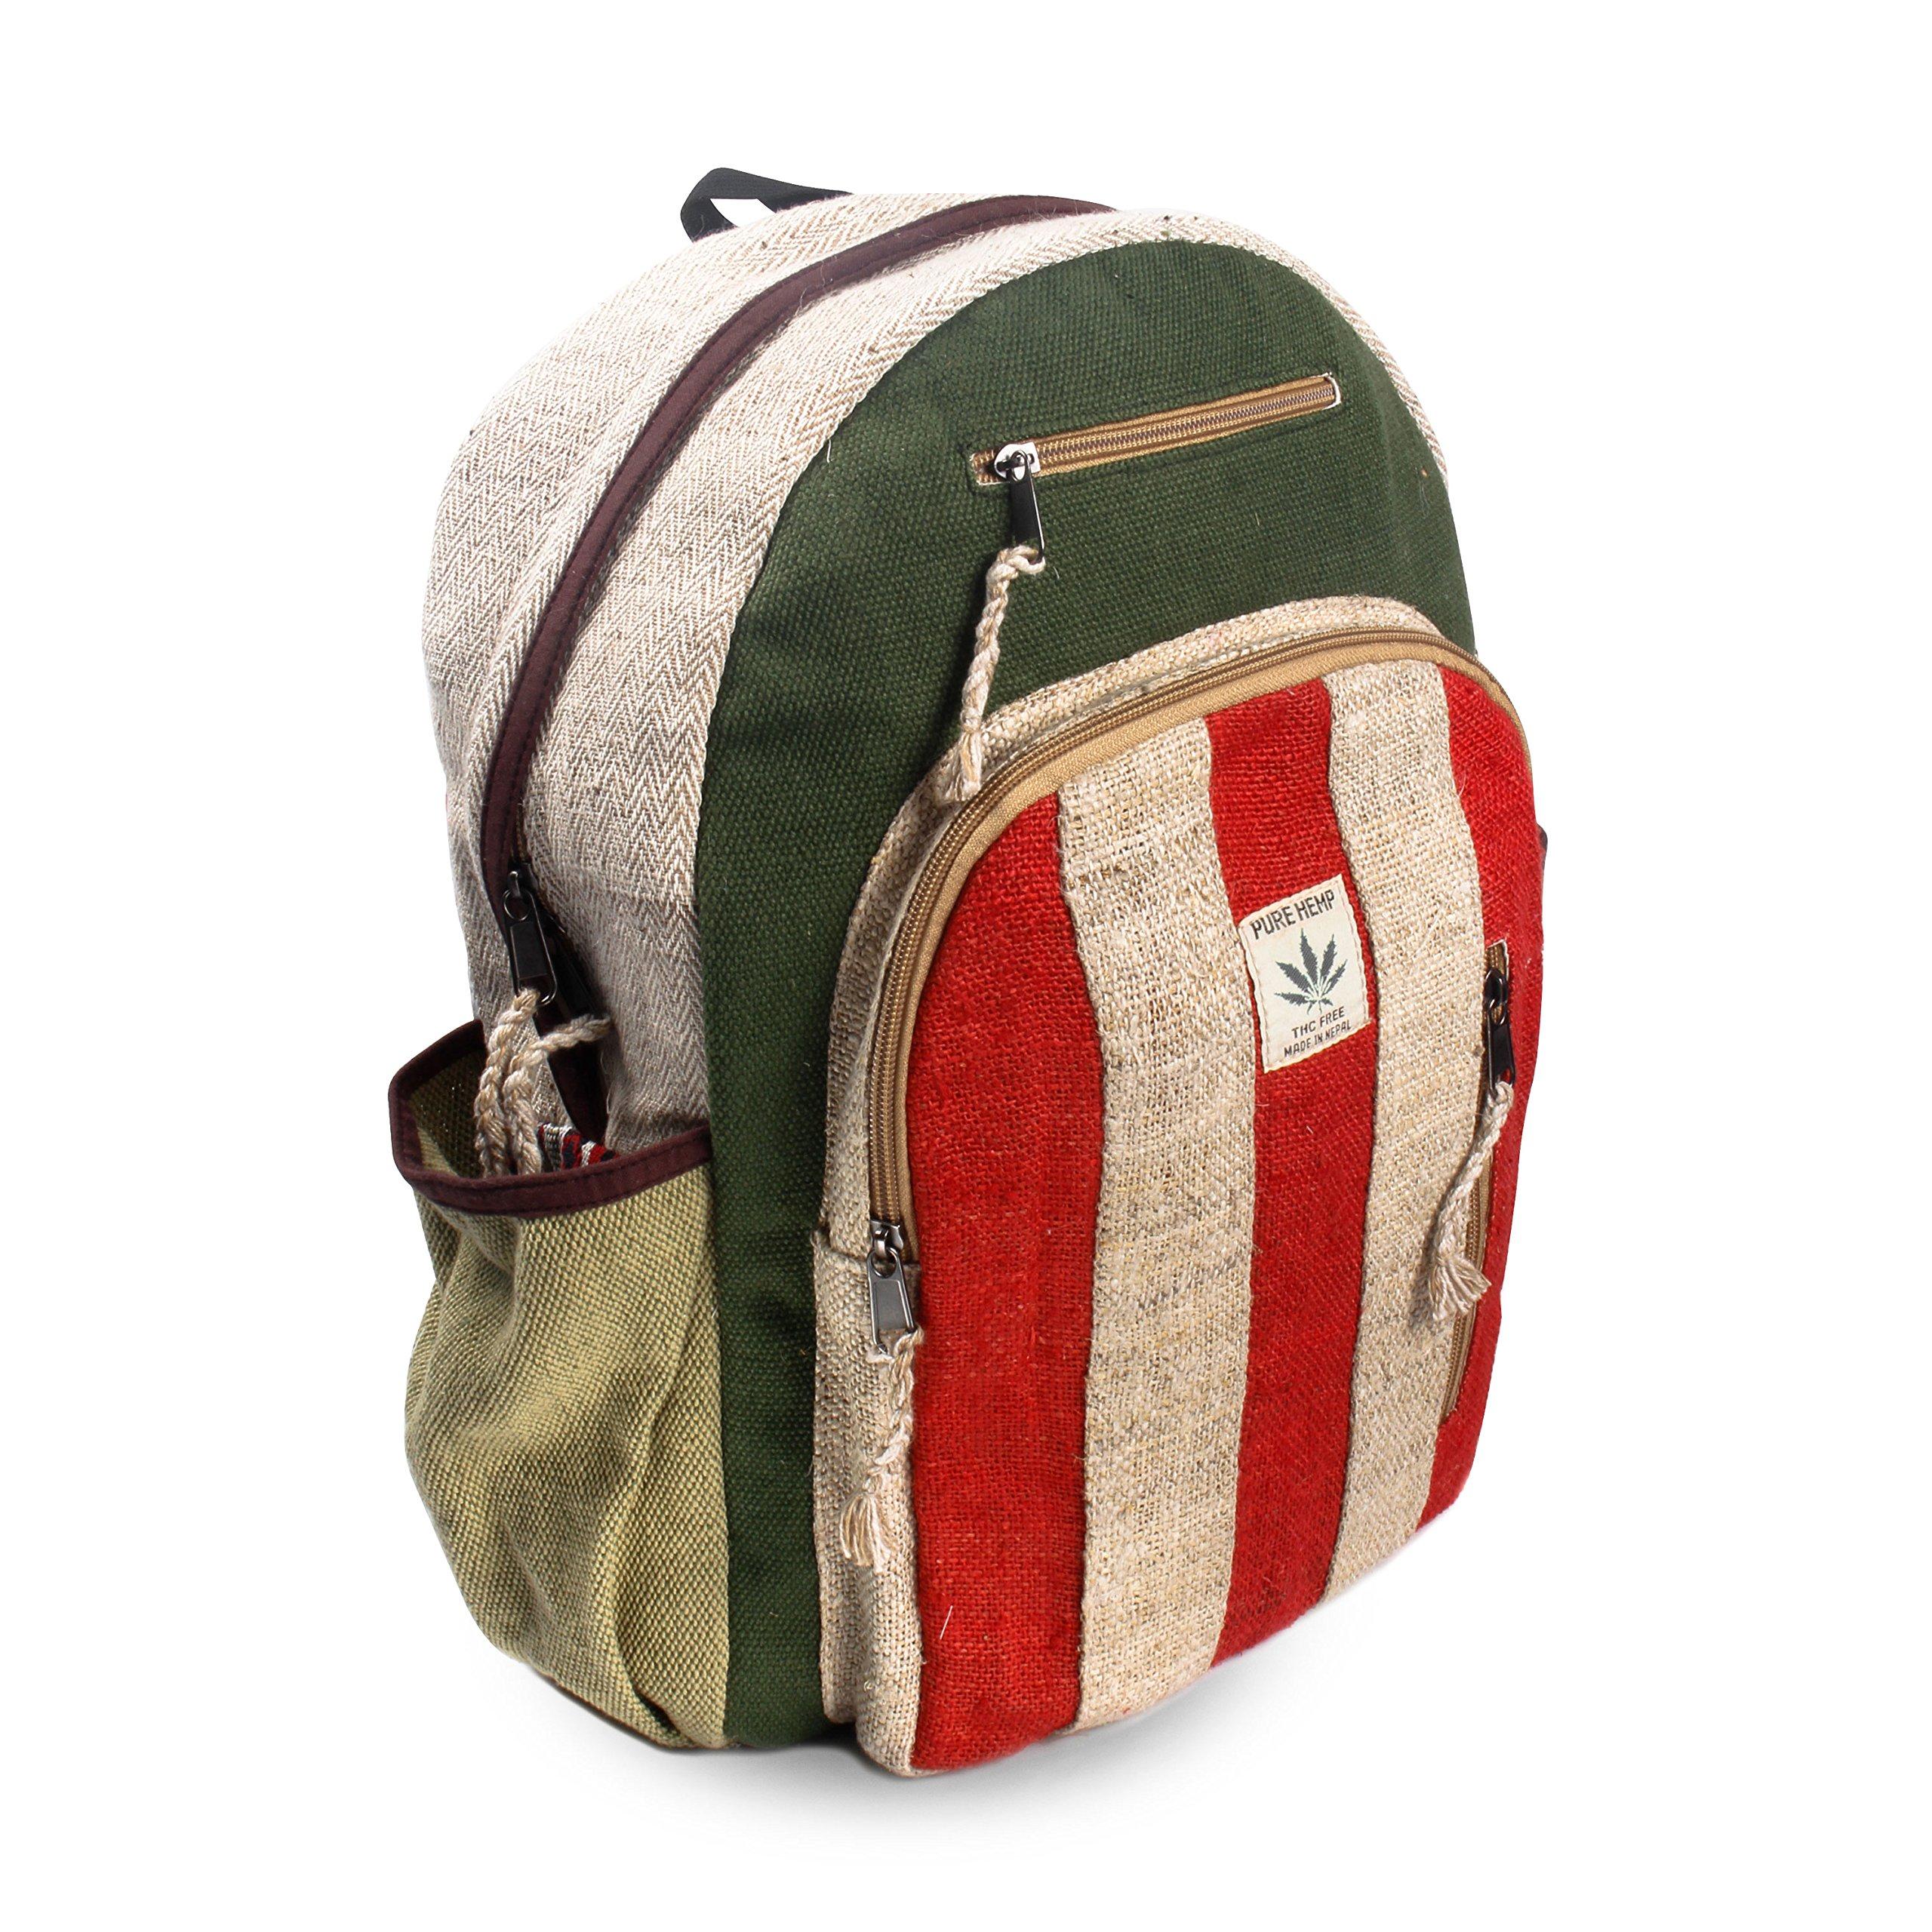 Maha Bodhi All Natural Handmade Multi Pocket Hemp Laptop Backpack - Trendy Style by Maha Bodhi